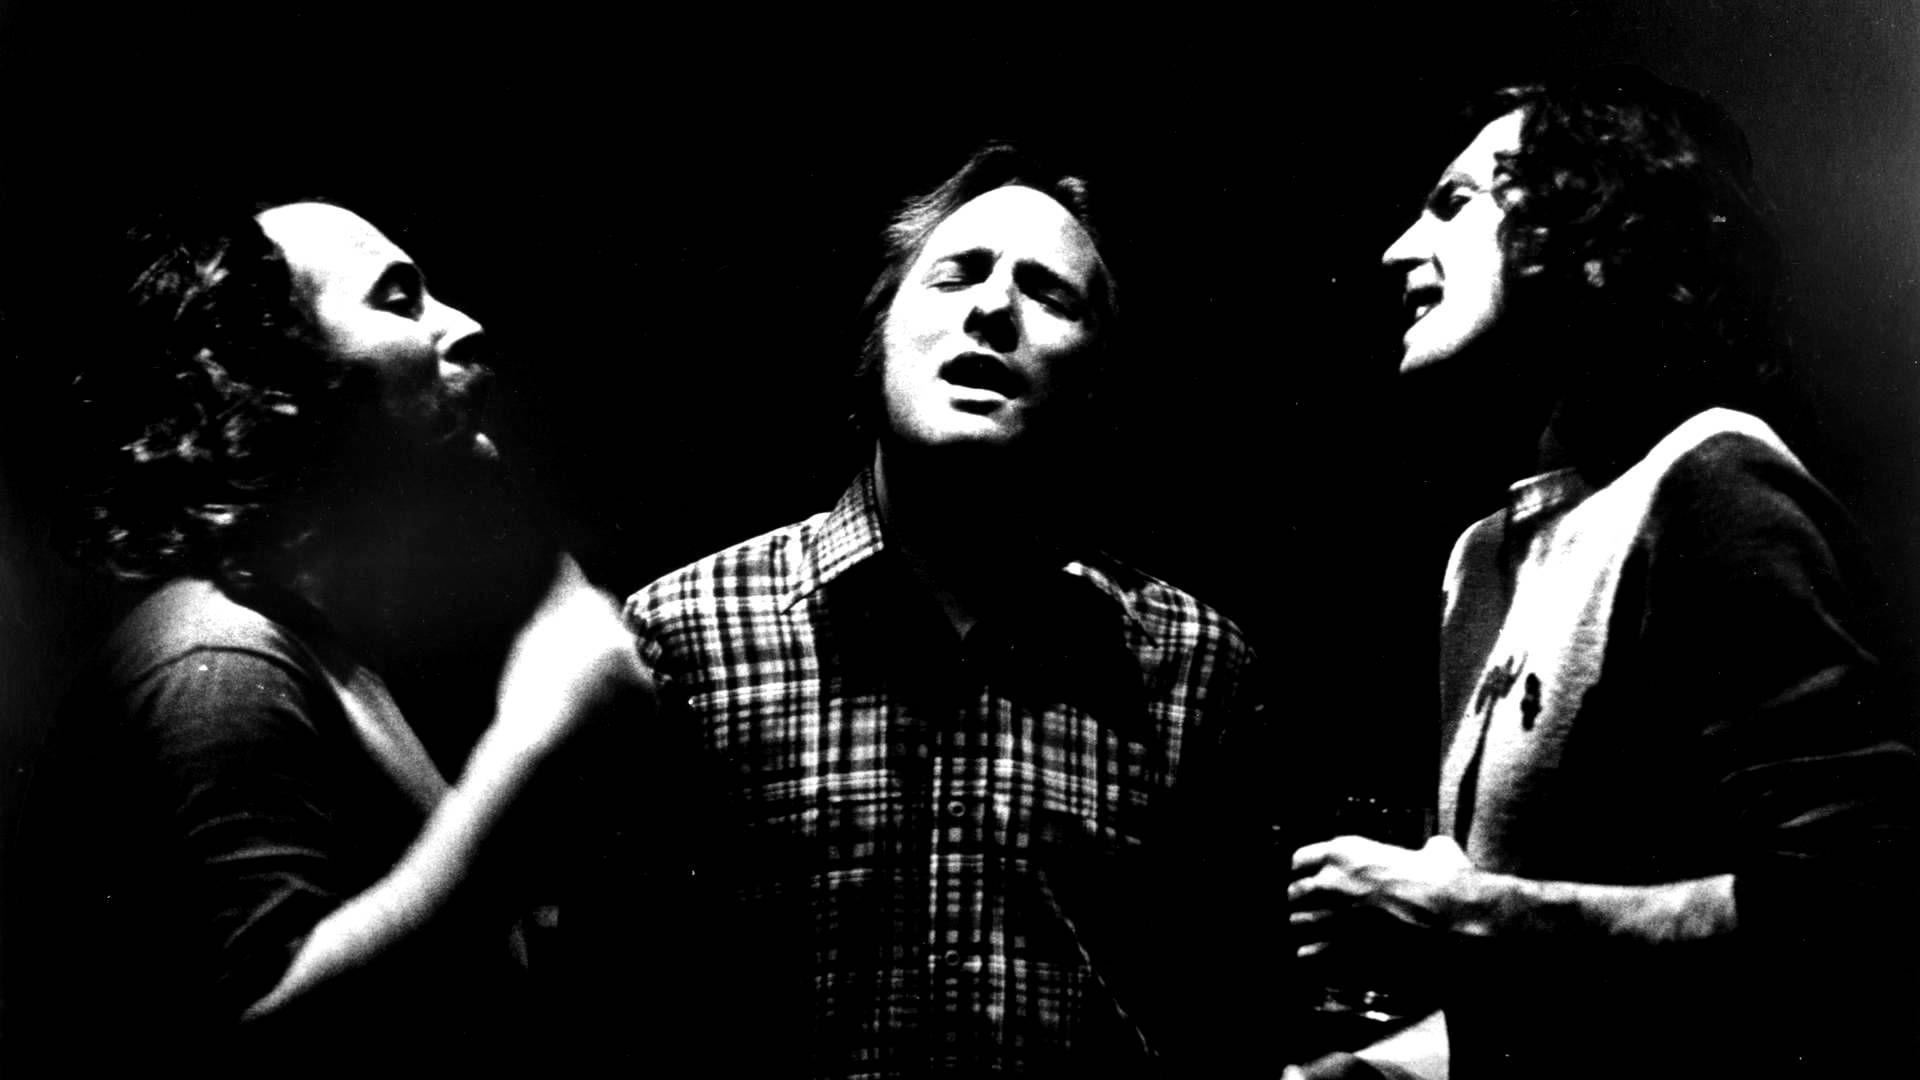 crosby, stills, nash & young dark star album : csn (1977). music